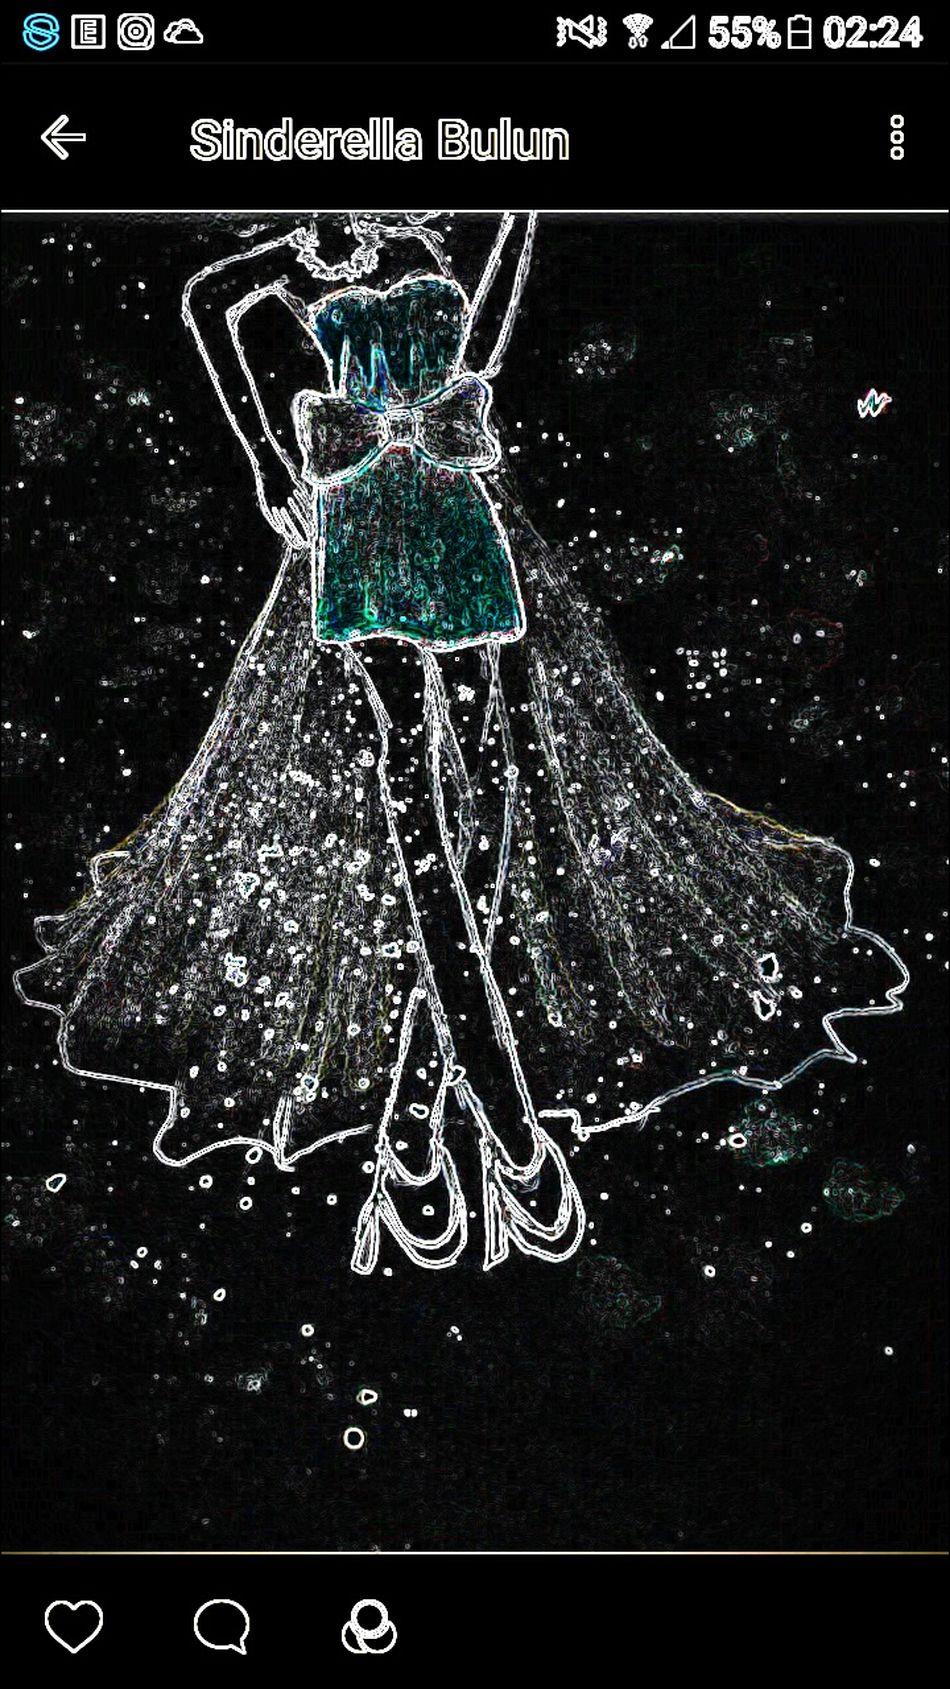 When dark come Fliter Details Textures And Shapes Creativity Dreamsinderella Dreamsinderelladesign Green Color Galaxy Starlight Galaxydress Mydesign Fashion Studio Shot Night Close-up Design